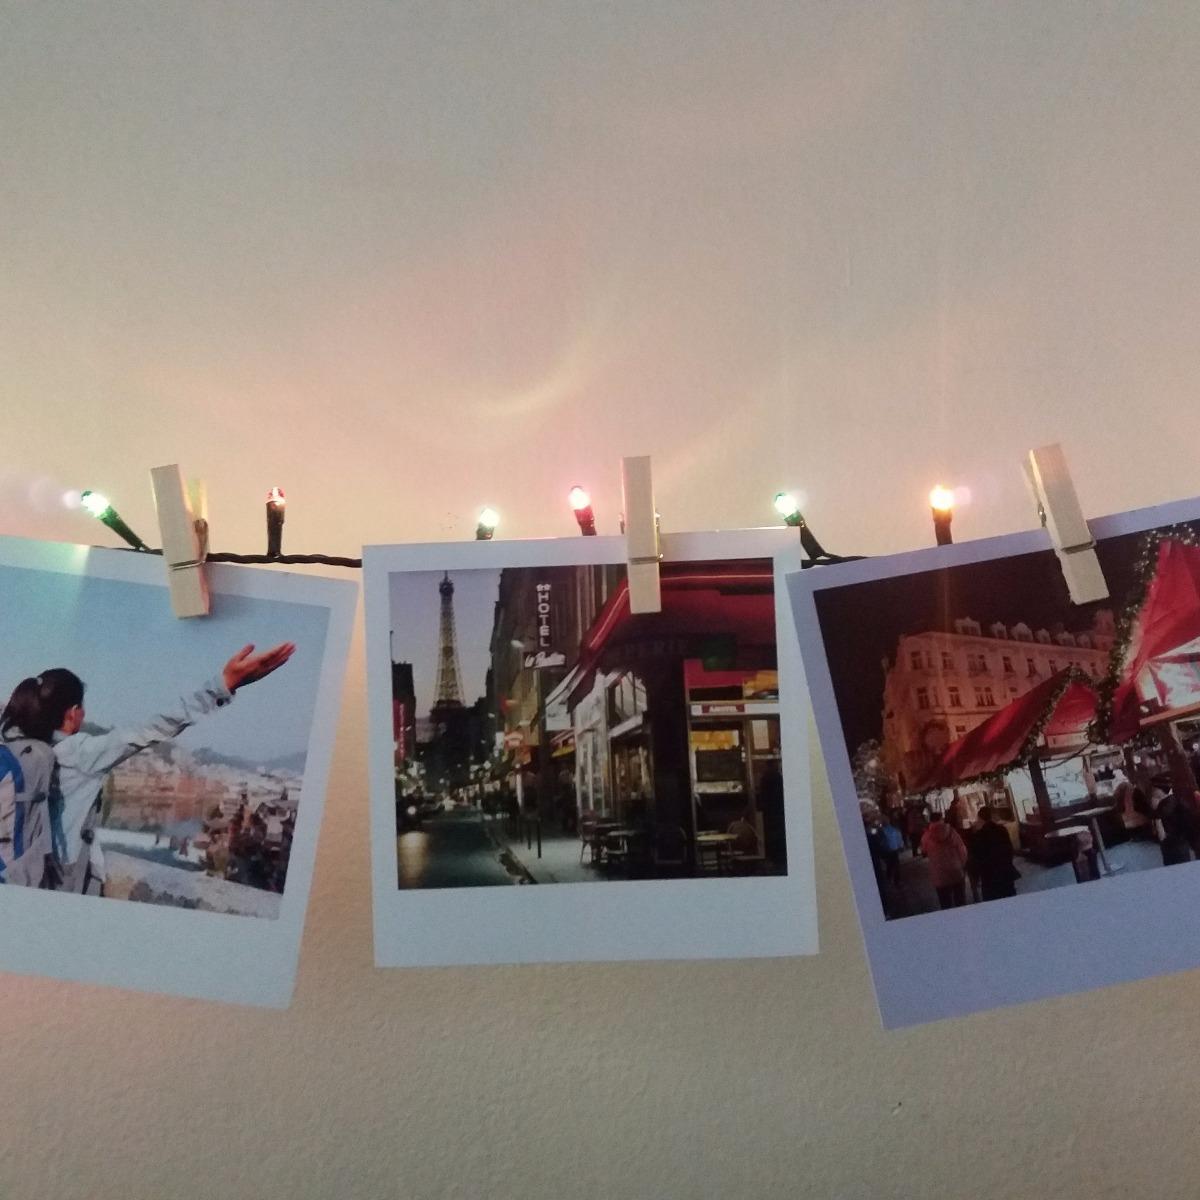 50 Fotos Estilo Polaroid Papel Fotografico Mate - $ 250,00 en ...